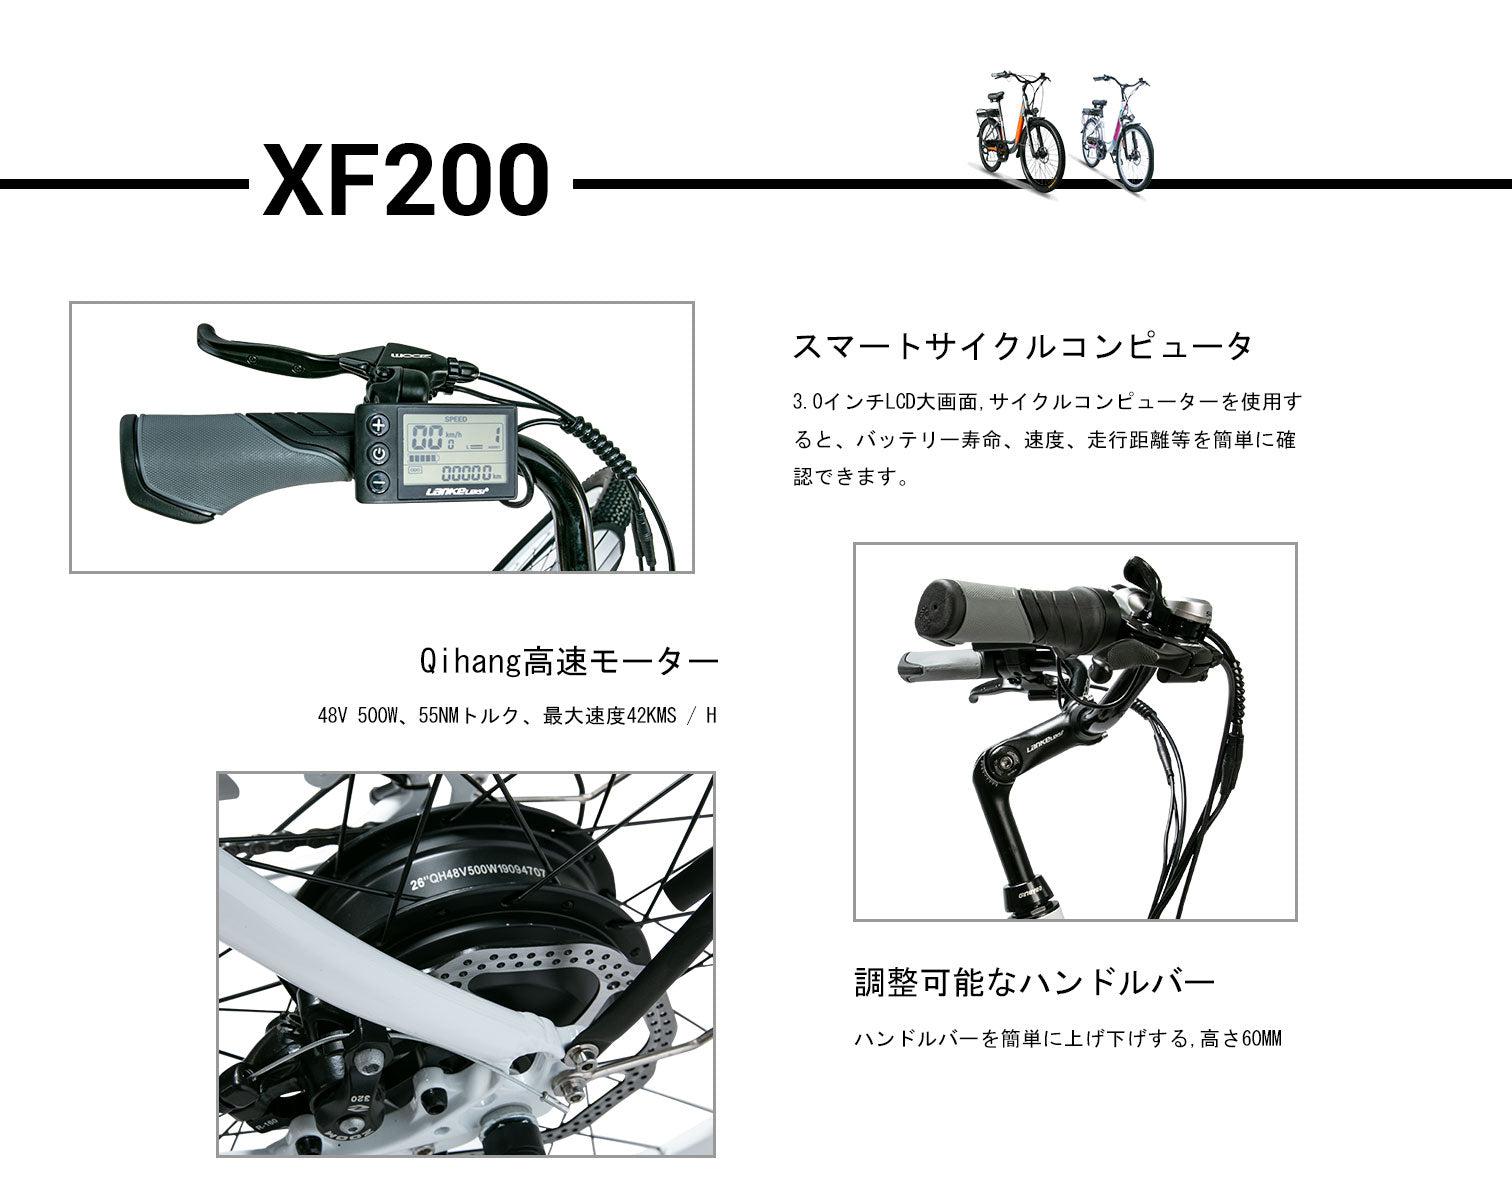 XF200-JP-4